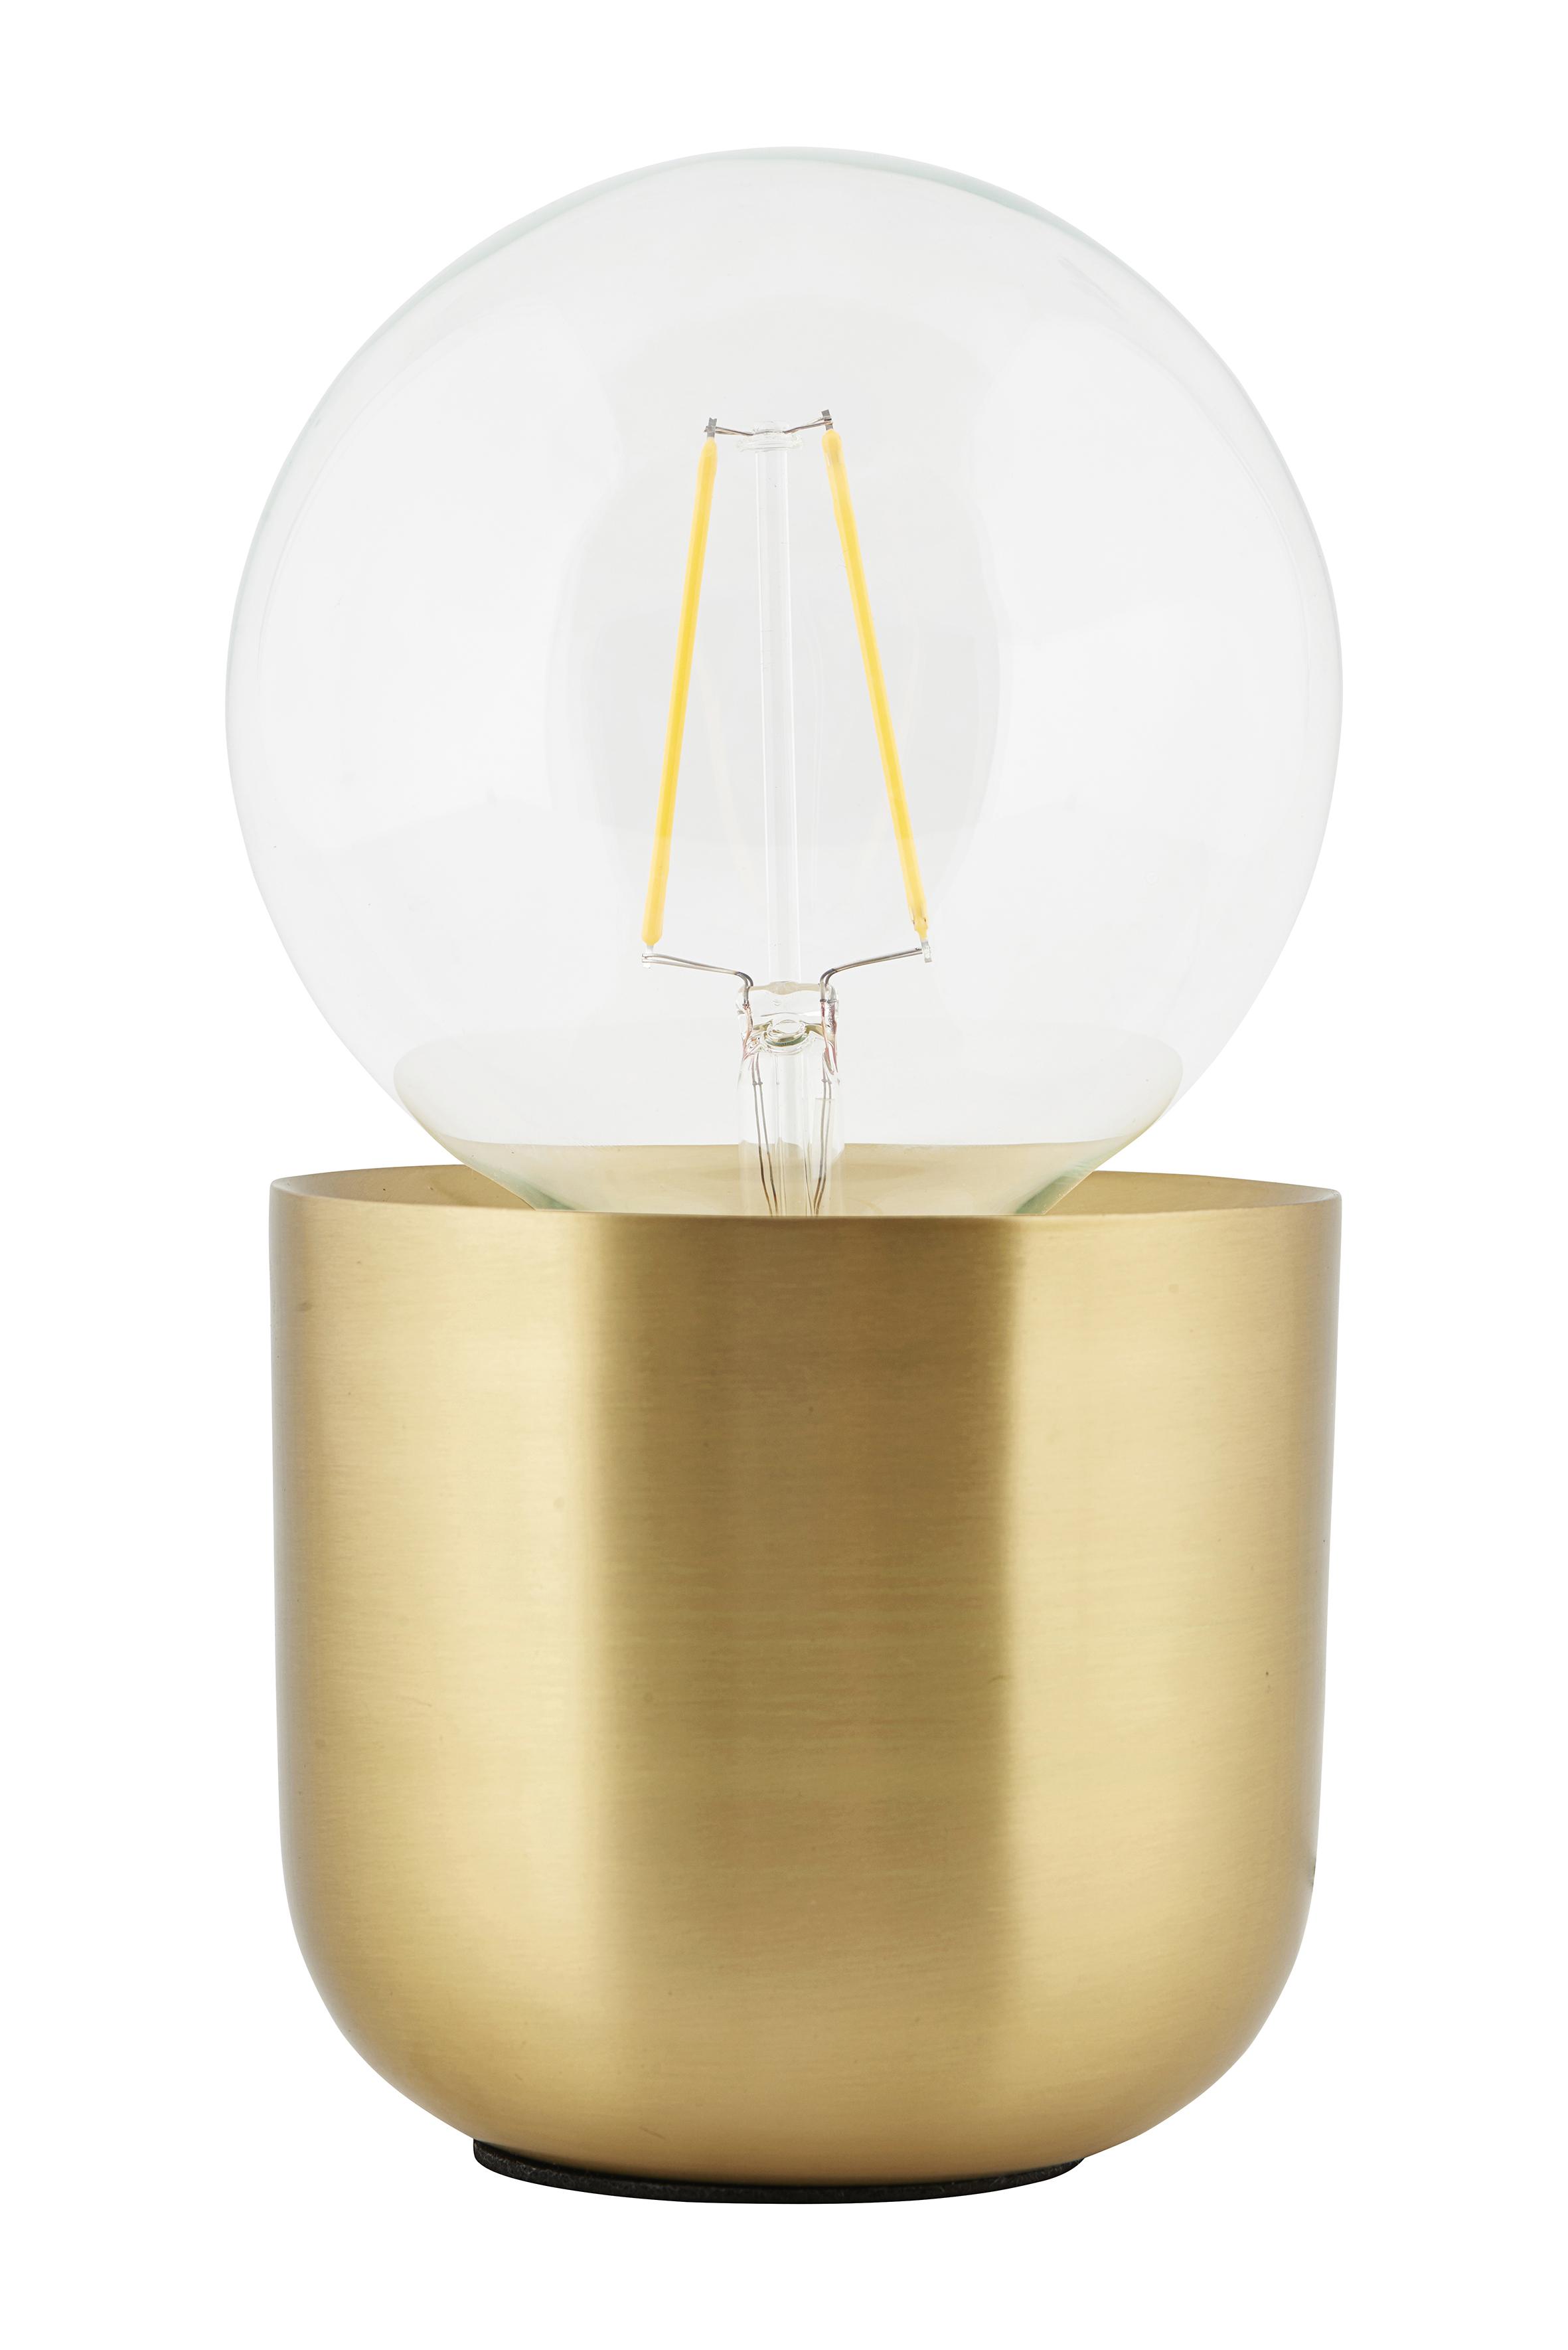 Gleam Bordslampa Mässing H:10,5 cm